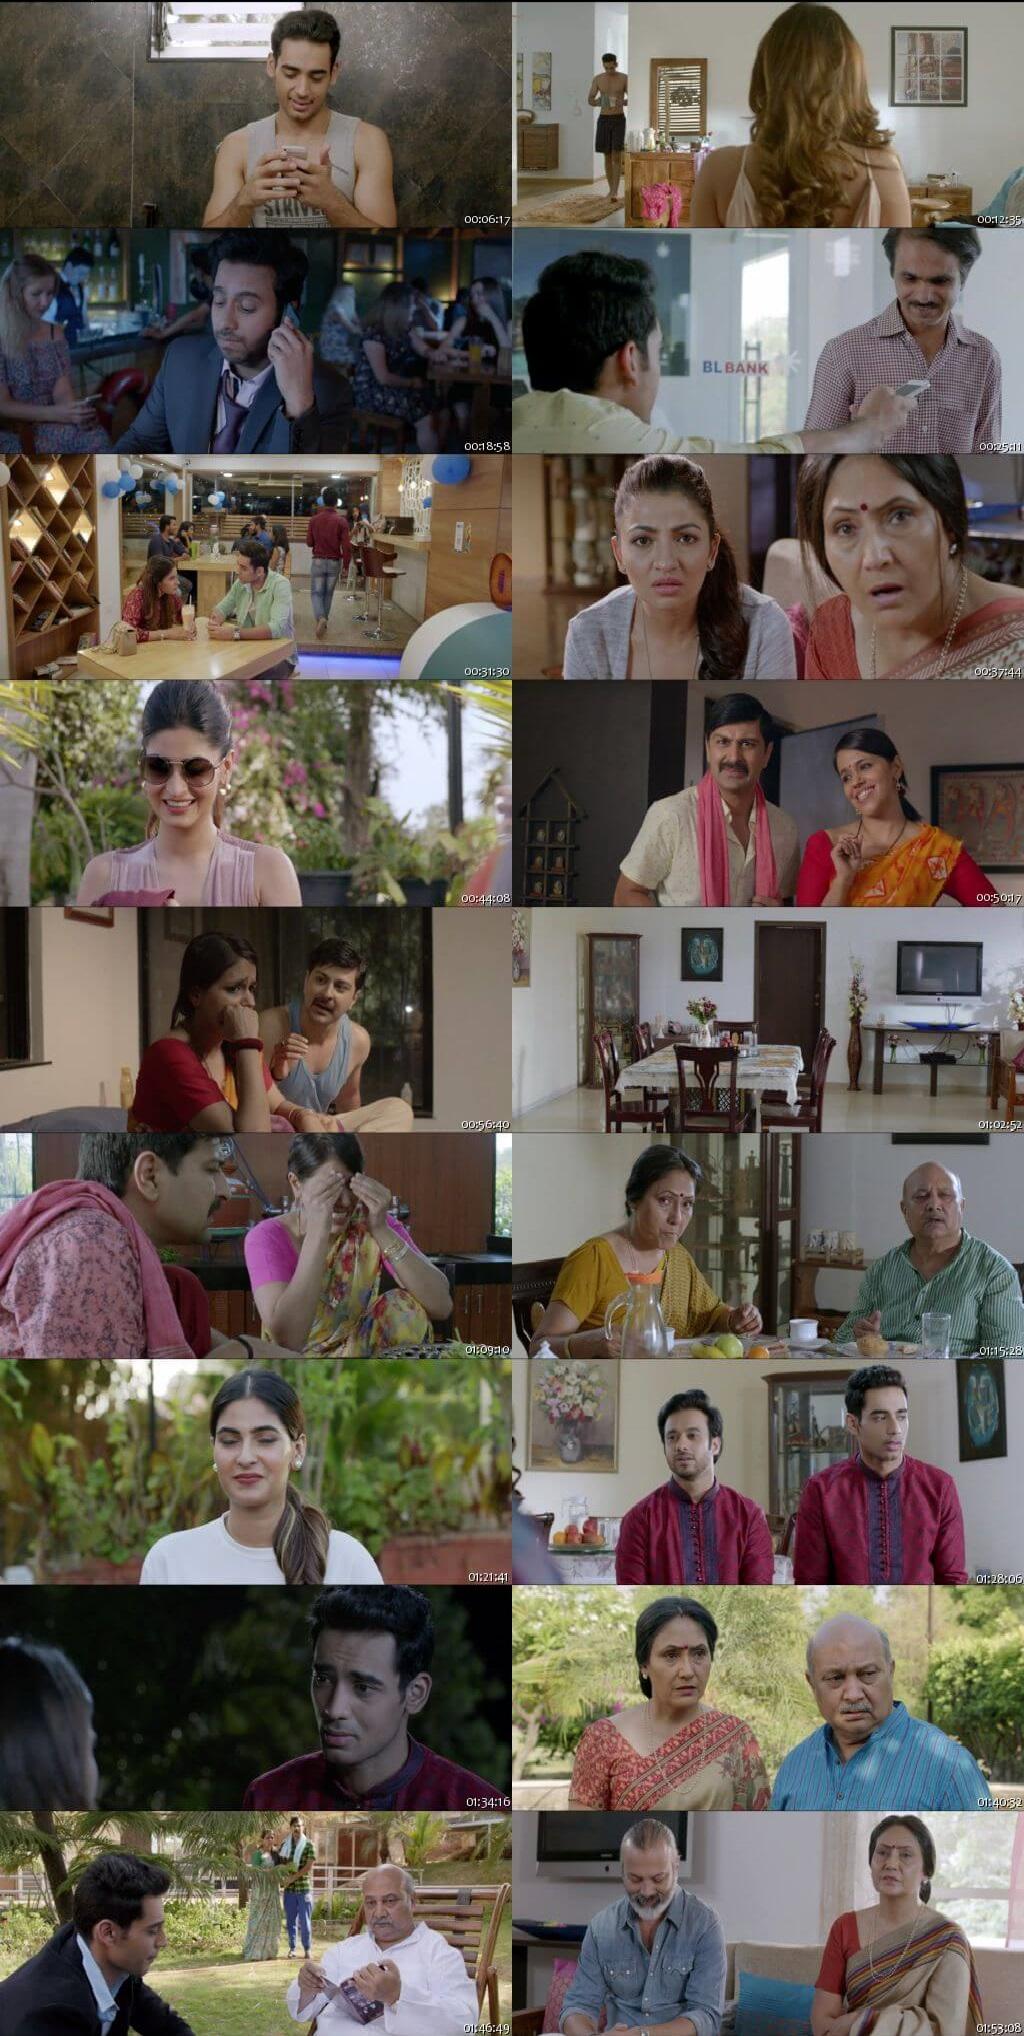 Fastey%2BFasaatey%2BScreenshots%2BHDRip Fastey Fasaatey 2019 Movie Download 300MB 480P Hindi HDRip Free